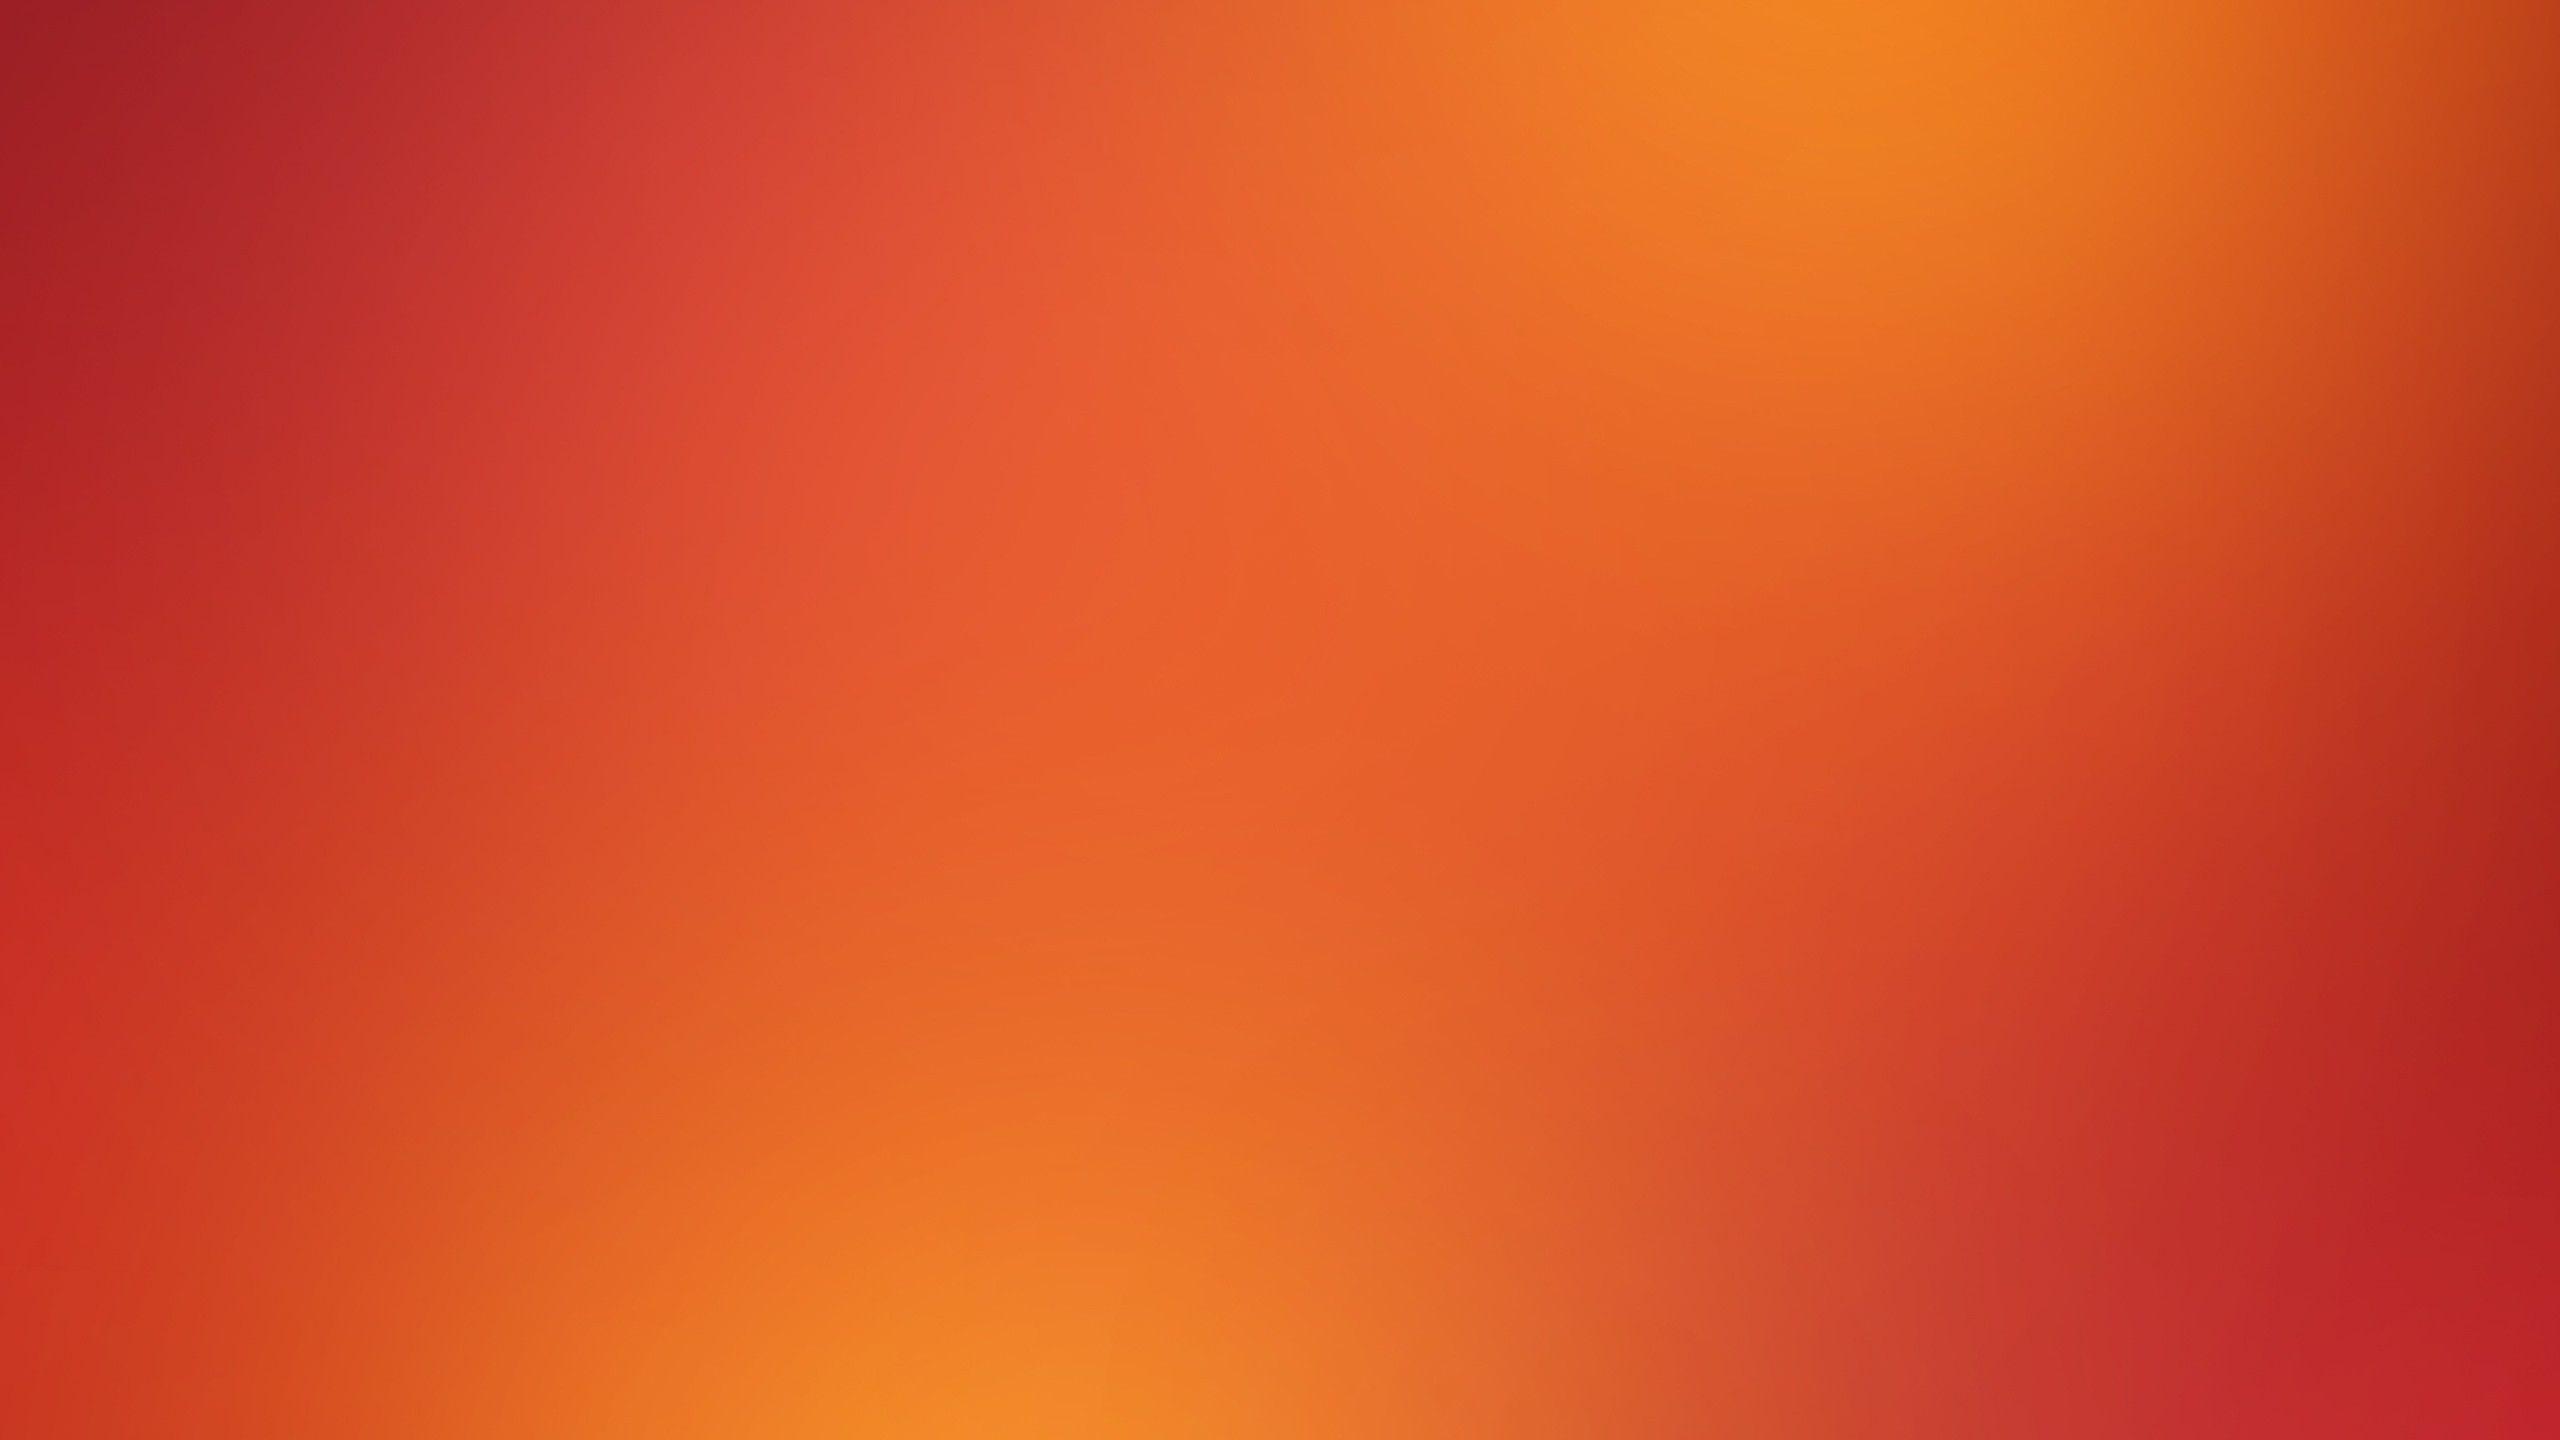 Wallpaper Orange Color 61 Images: Wallpapers Gradient